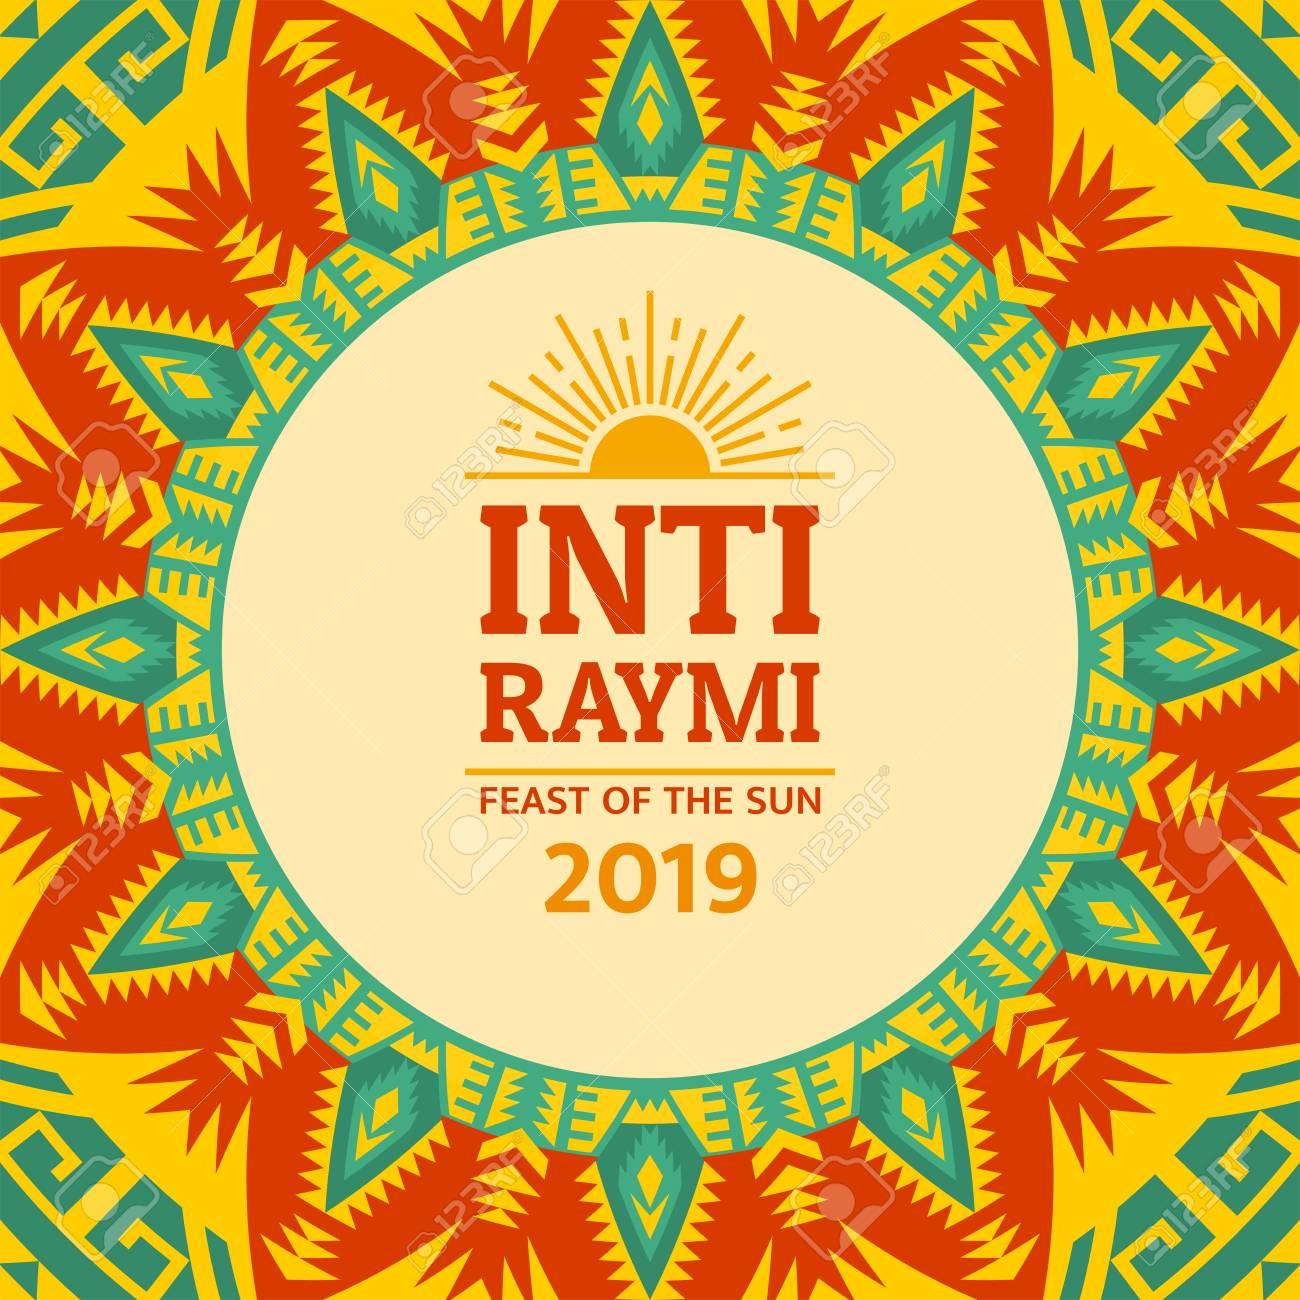 Religious festival Inti Raymi. Inca celebration of the Sun. Pagan holiday in Peru. - 122837780